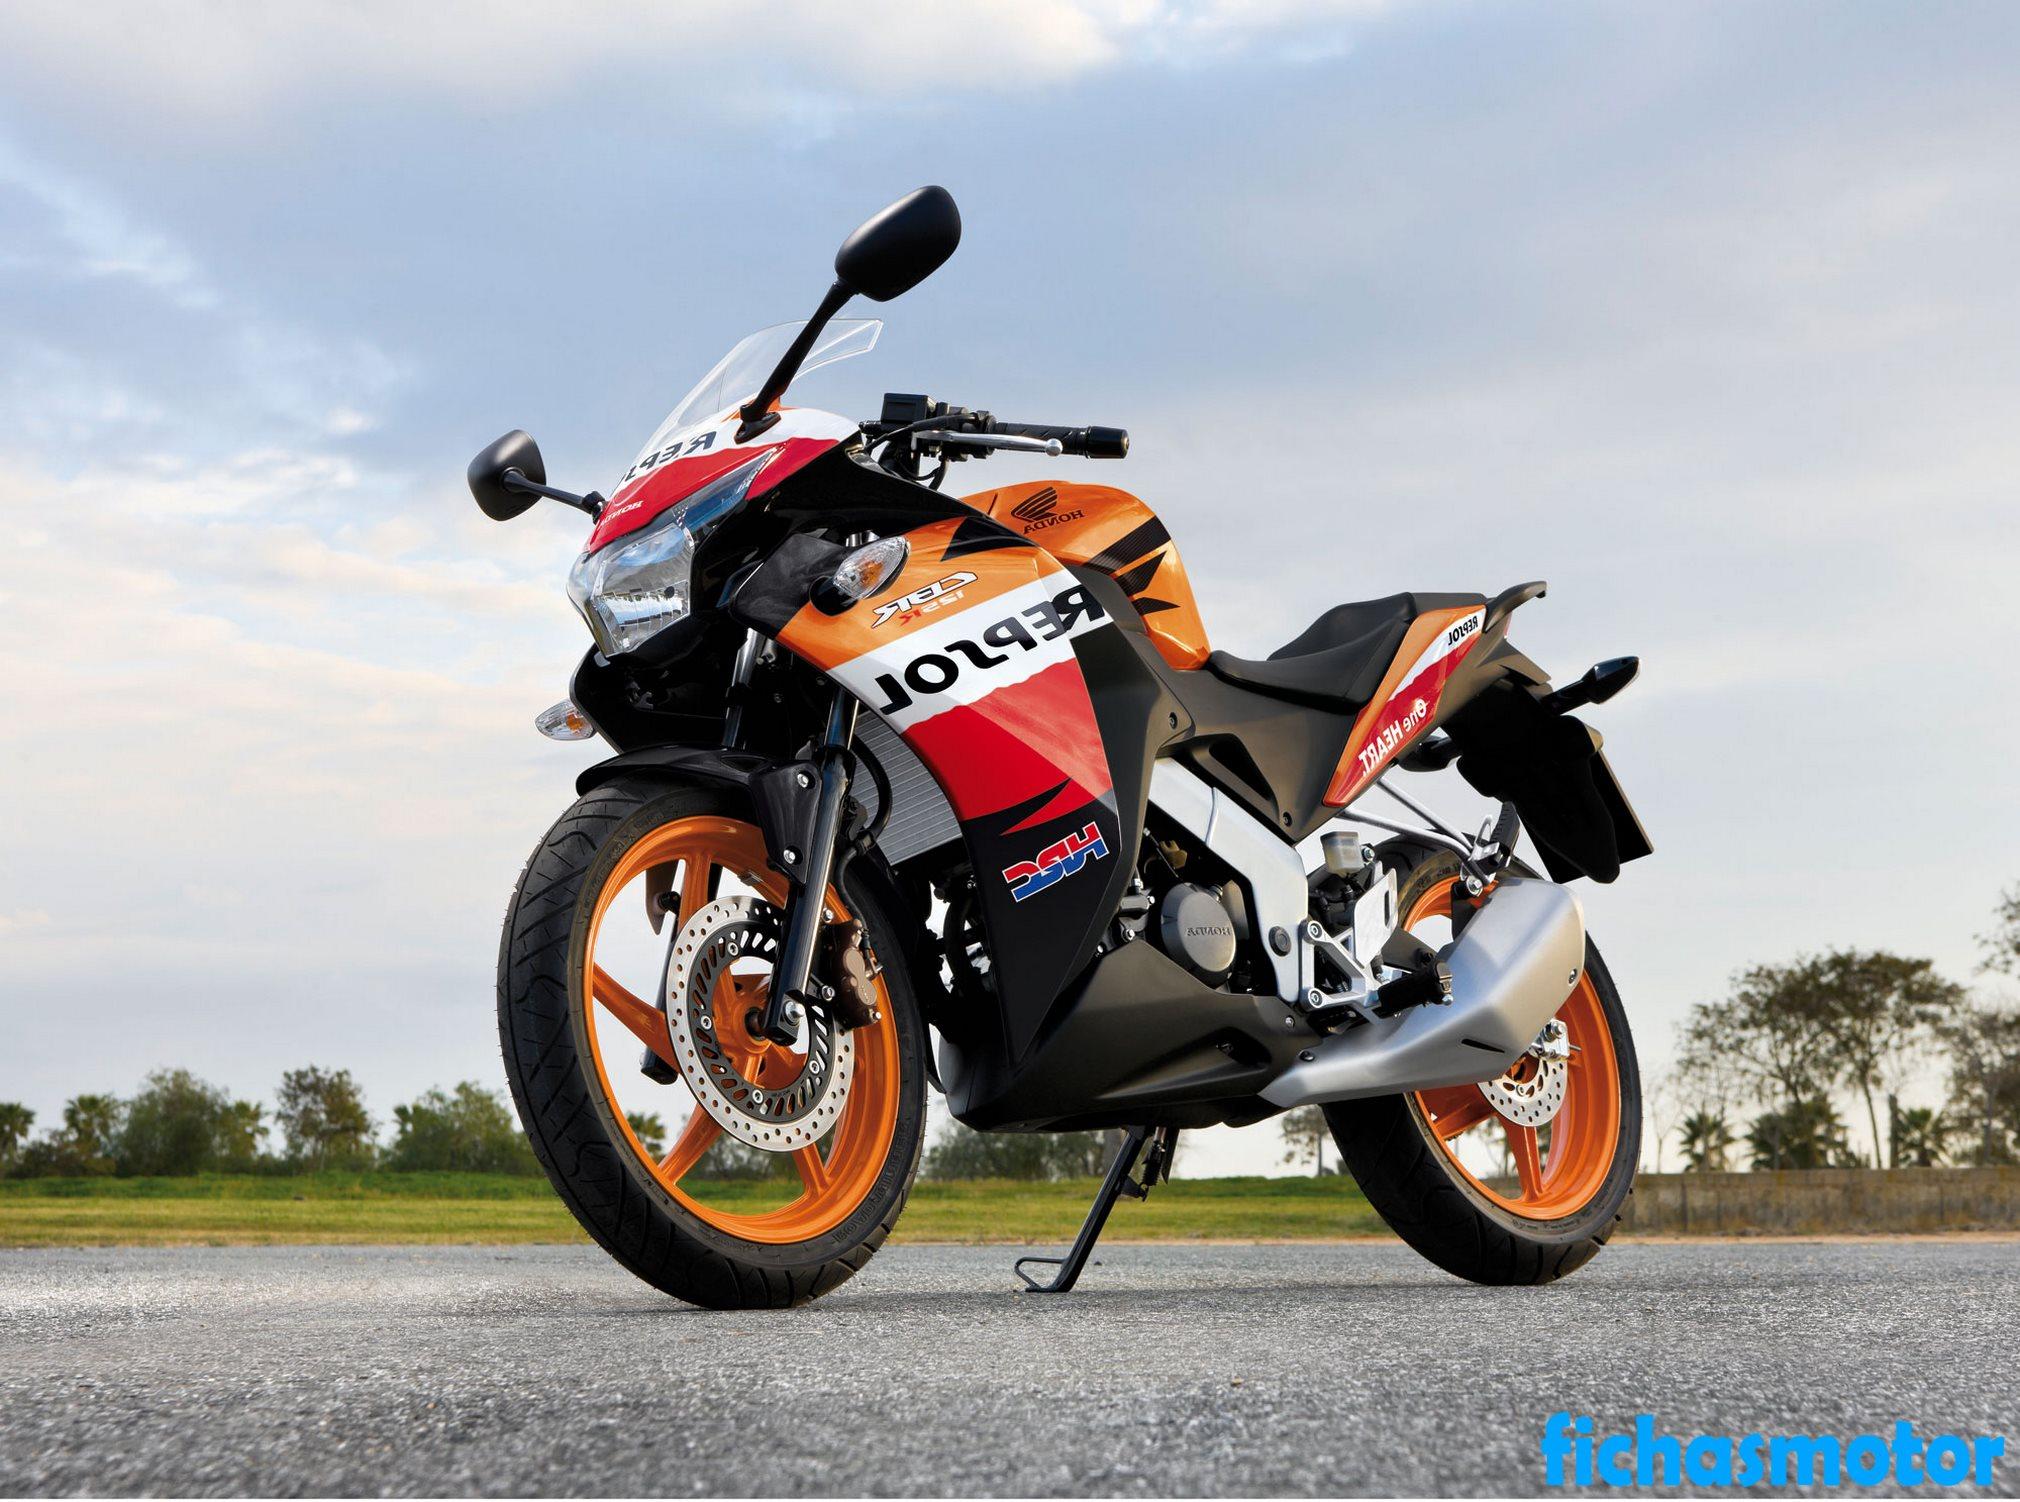 Imagen moto Honda cbr125r año 2012